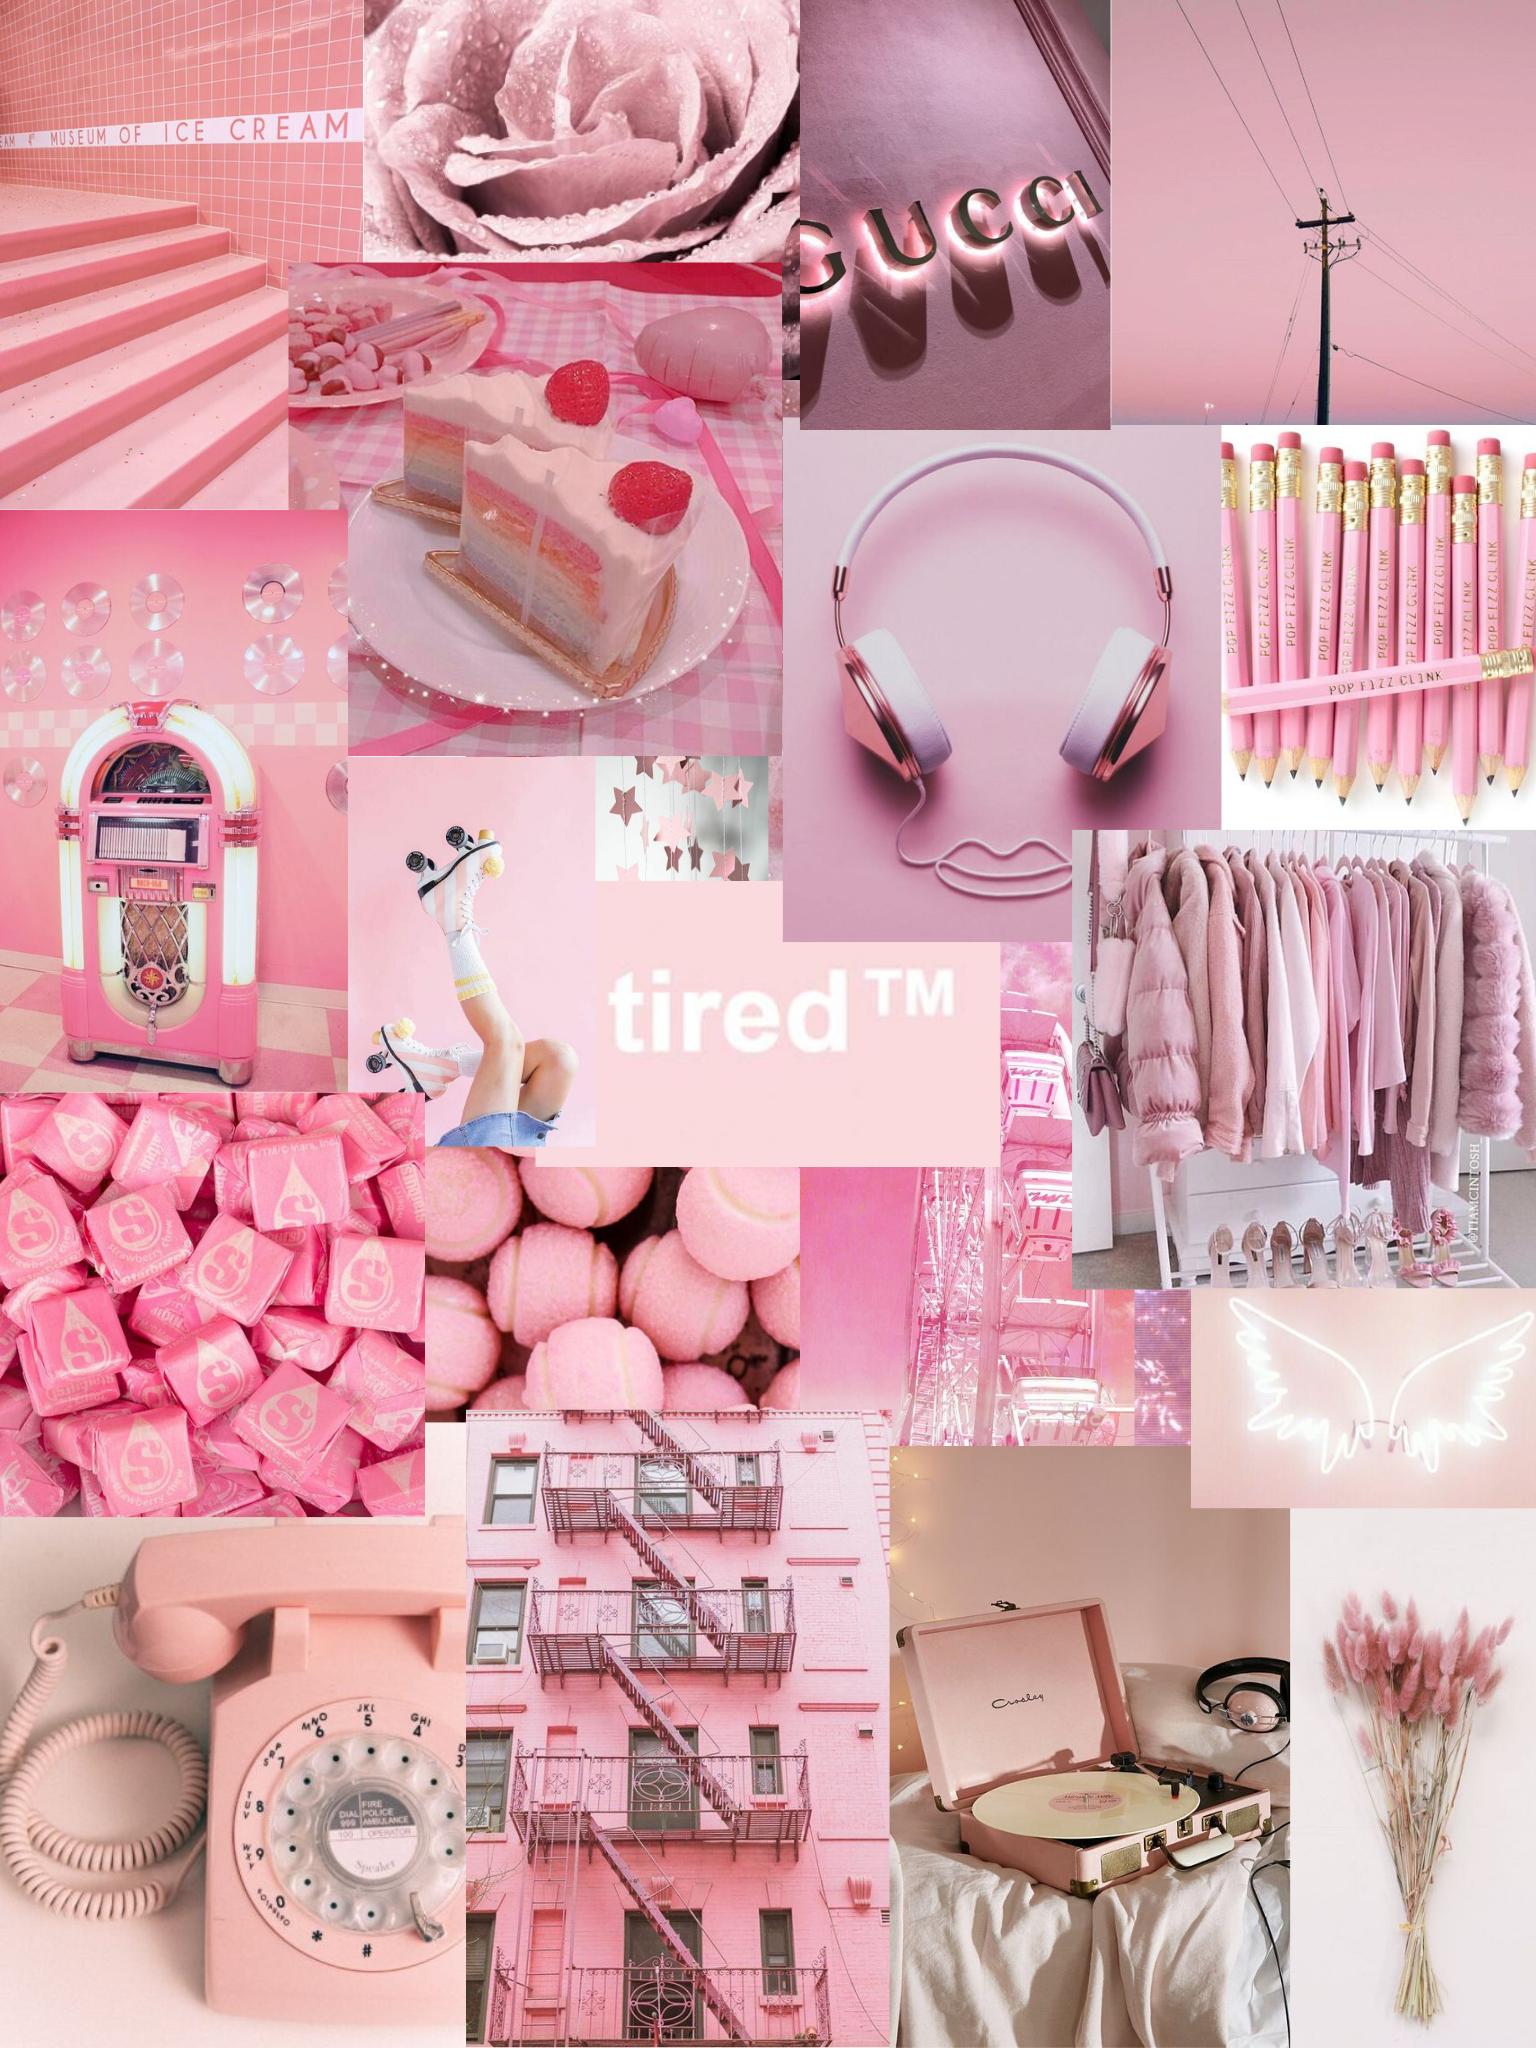 Aesthetic Pastel Pink Ipad Wallpaper Aesthetic Iphone Wallpaper Pastel Pink Aesthetic Pink Wallpaper